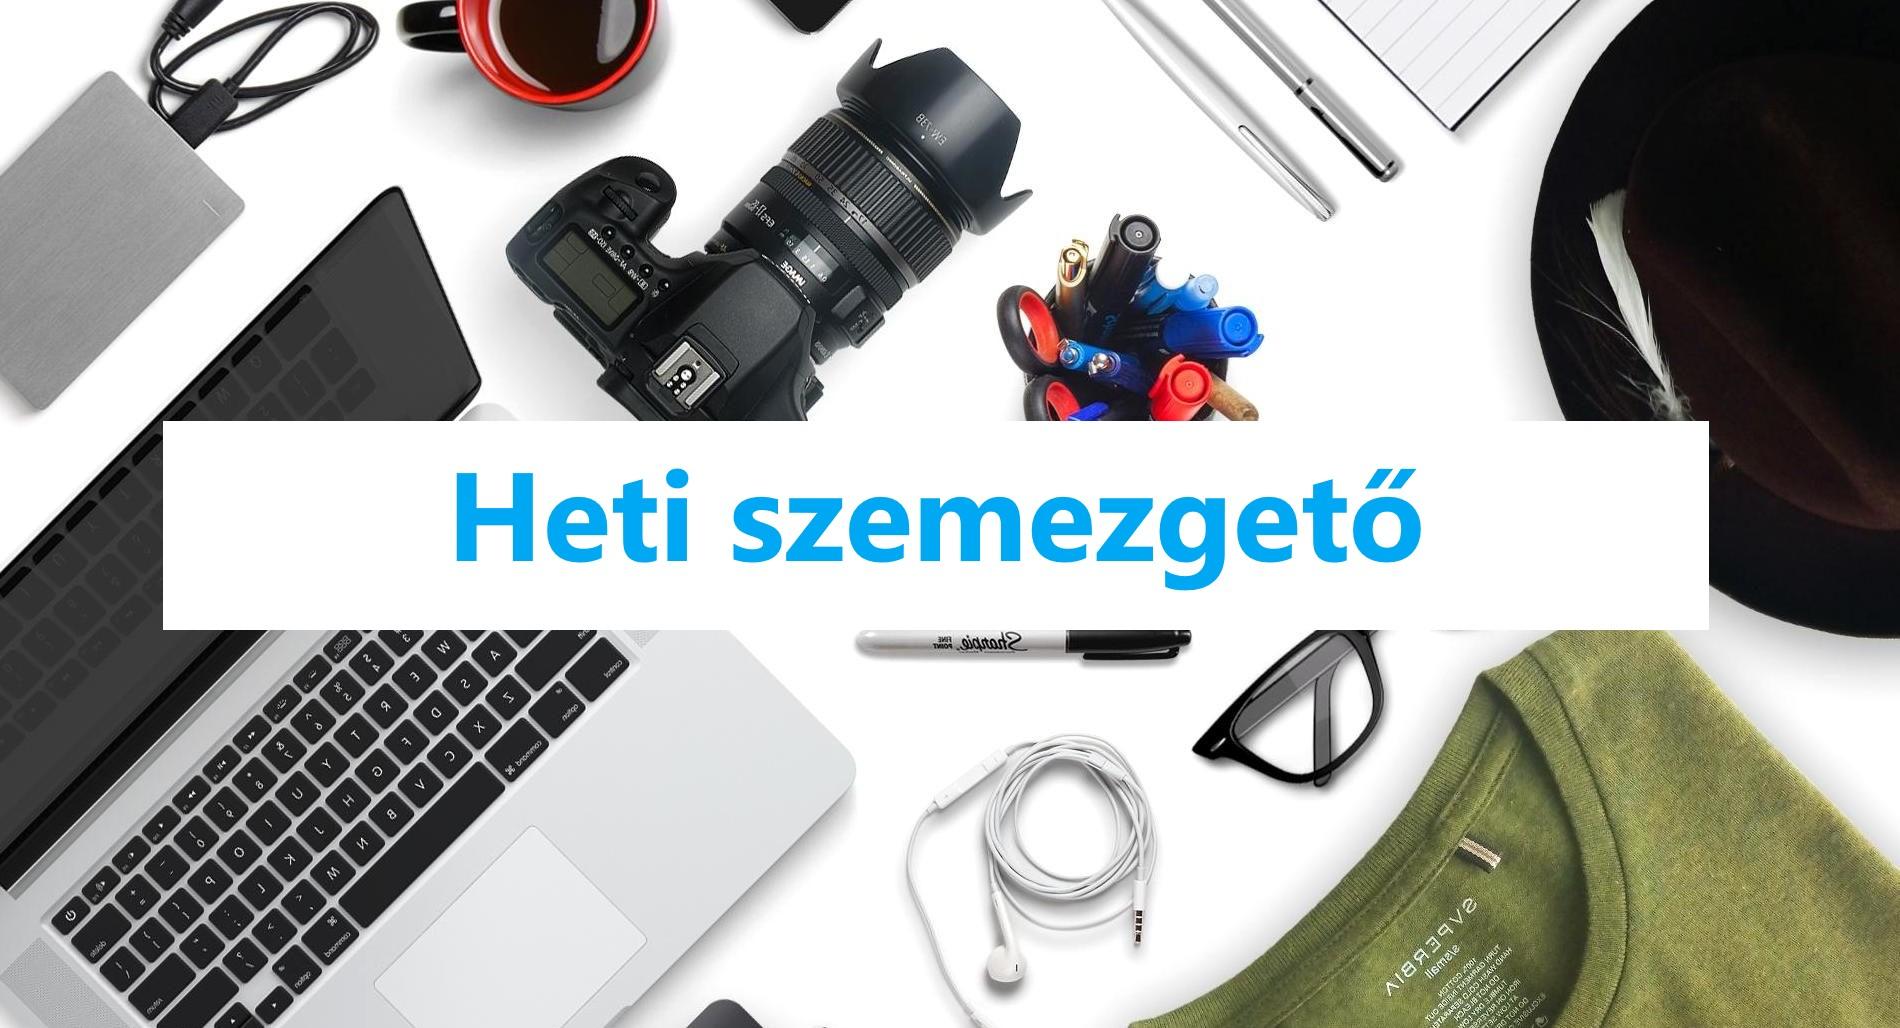 heti_szemezgeto_uj_20.jpg